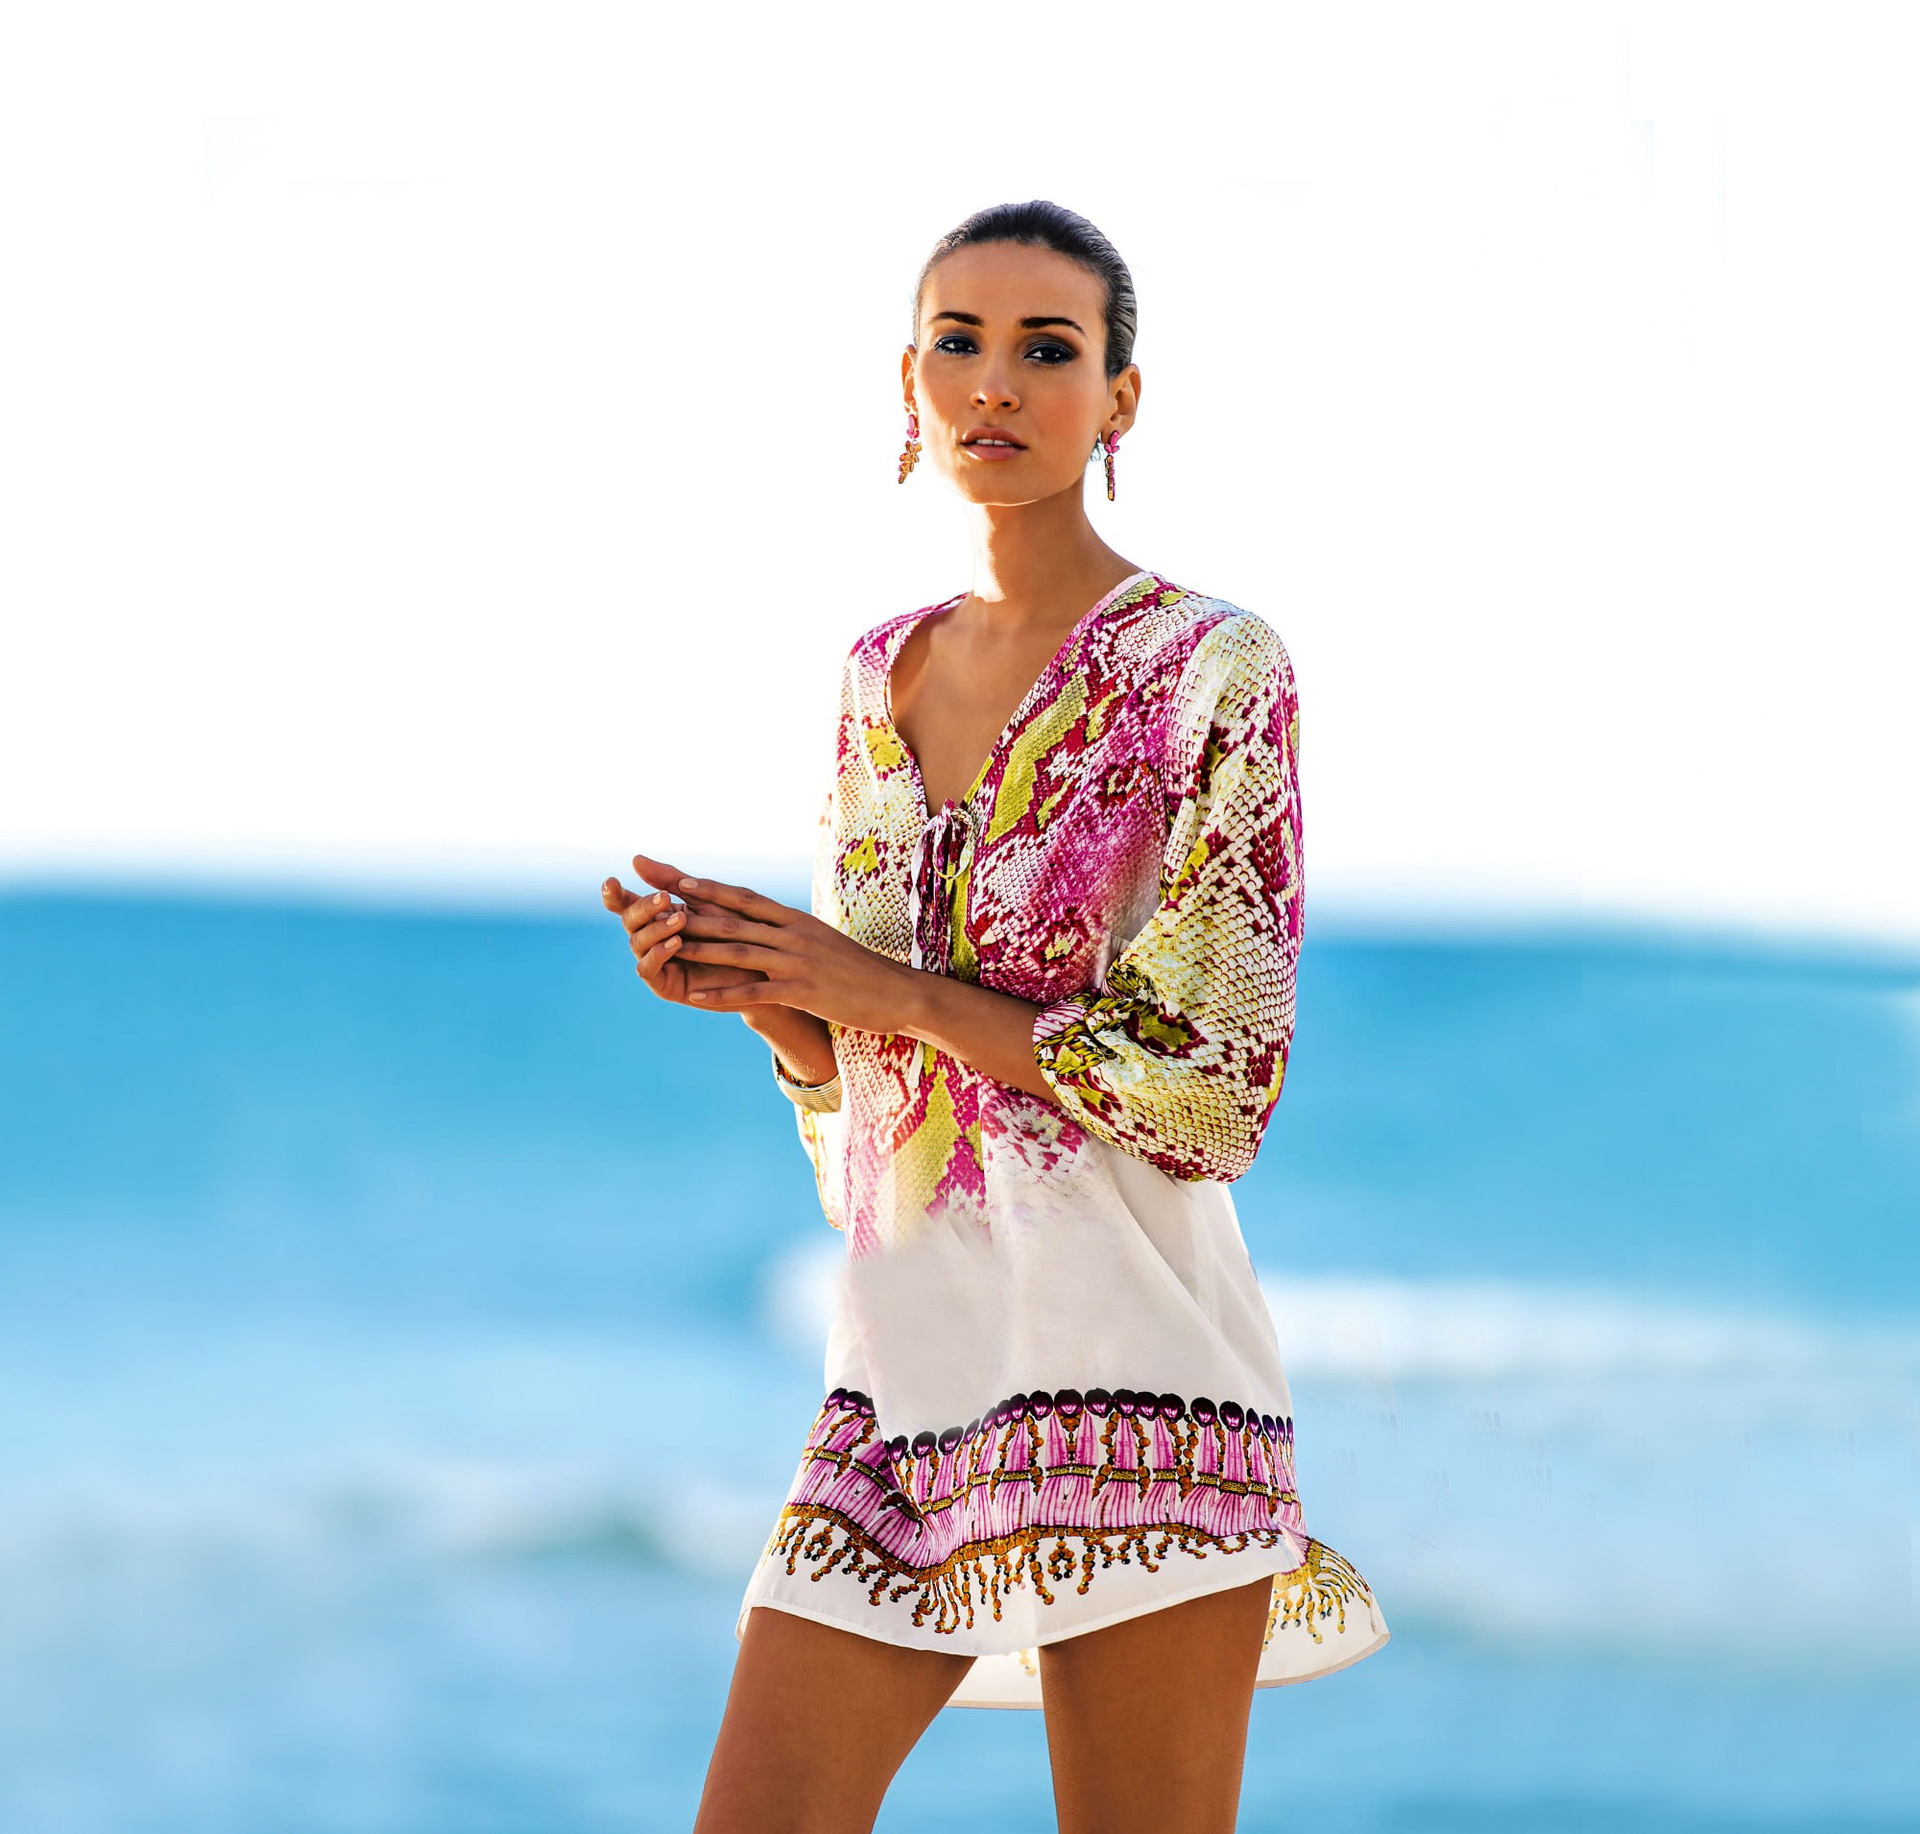 cc08154f176 Beach Swimwear Women Dress Cover Up Wear Women s Plus Size Tunic Beachwear  Snake Chiffon New Swimsuit Beach Bikinis Print